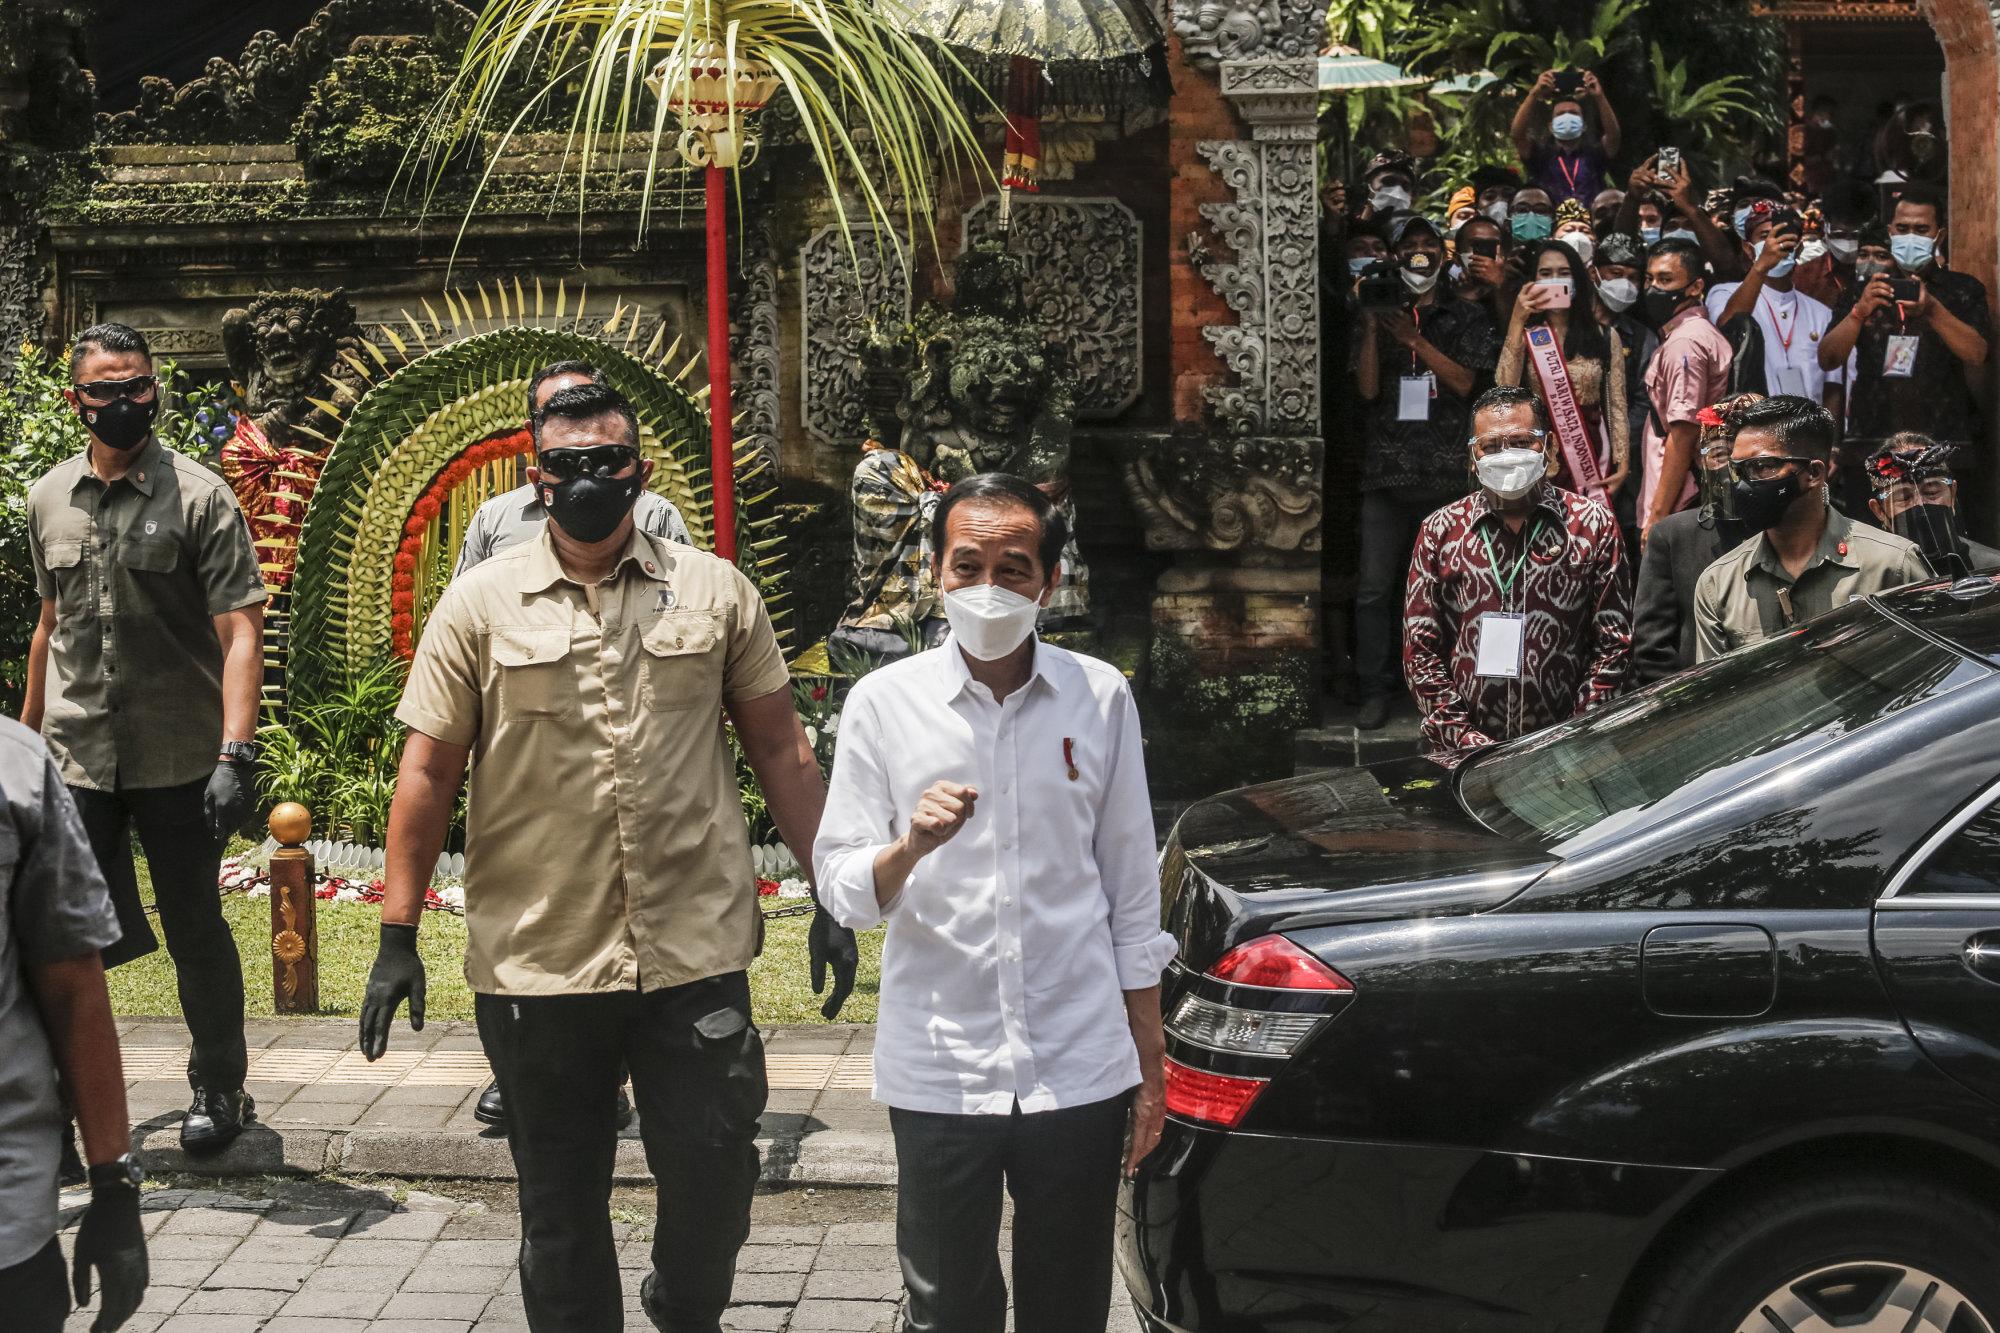 Indonesian President Joko Widodo arrives in Ubud, Bali, on March 16. Photo: Getty Images